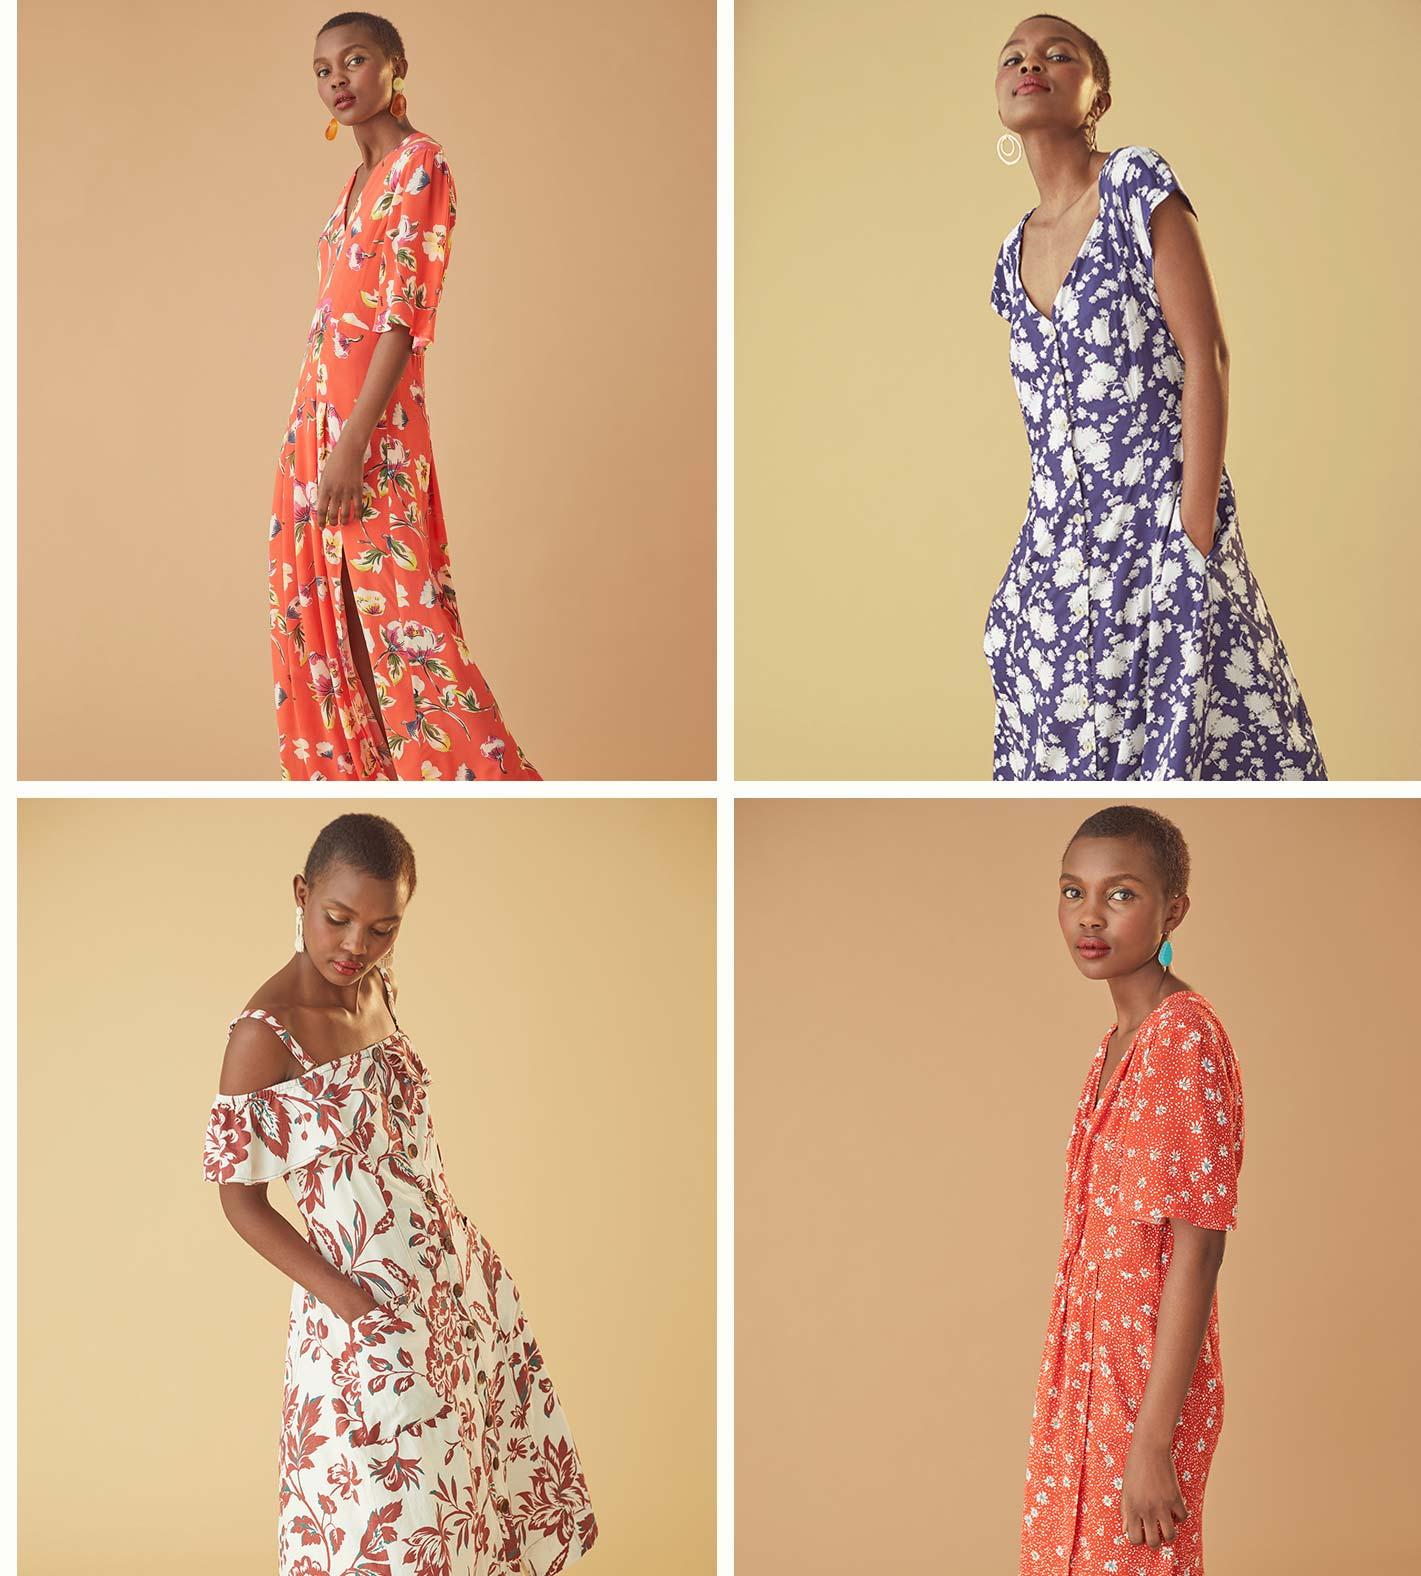 e06850c48aa dresses. Shop new styles